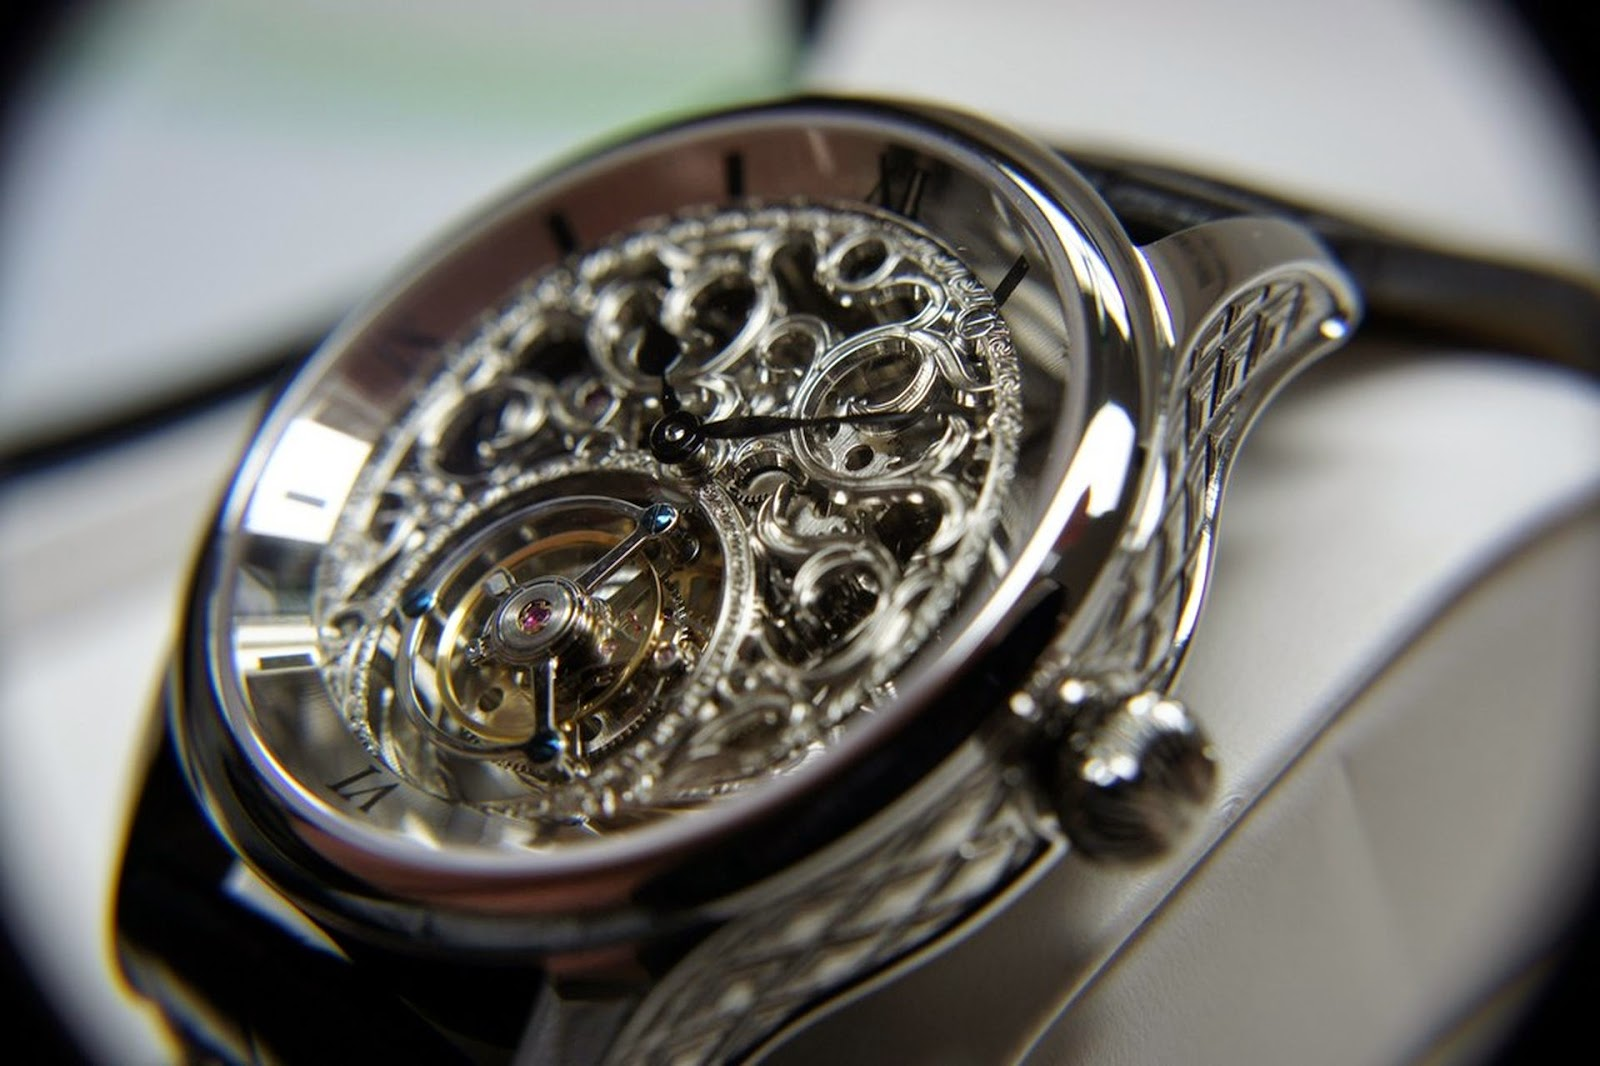 MOI TOURBILLON II watch